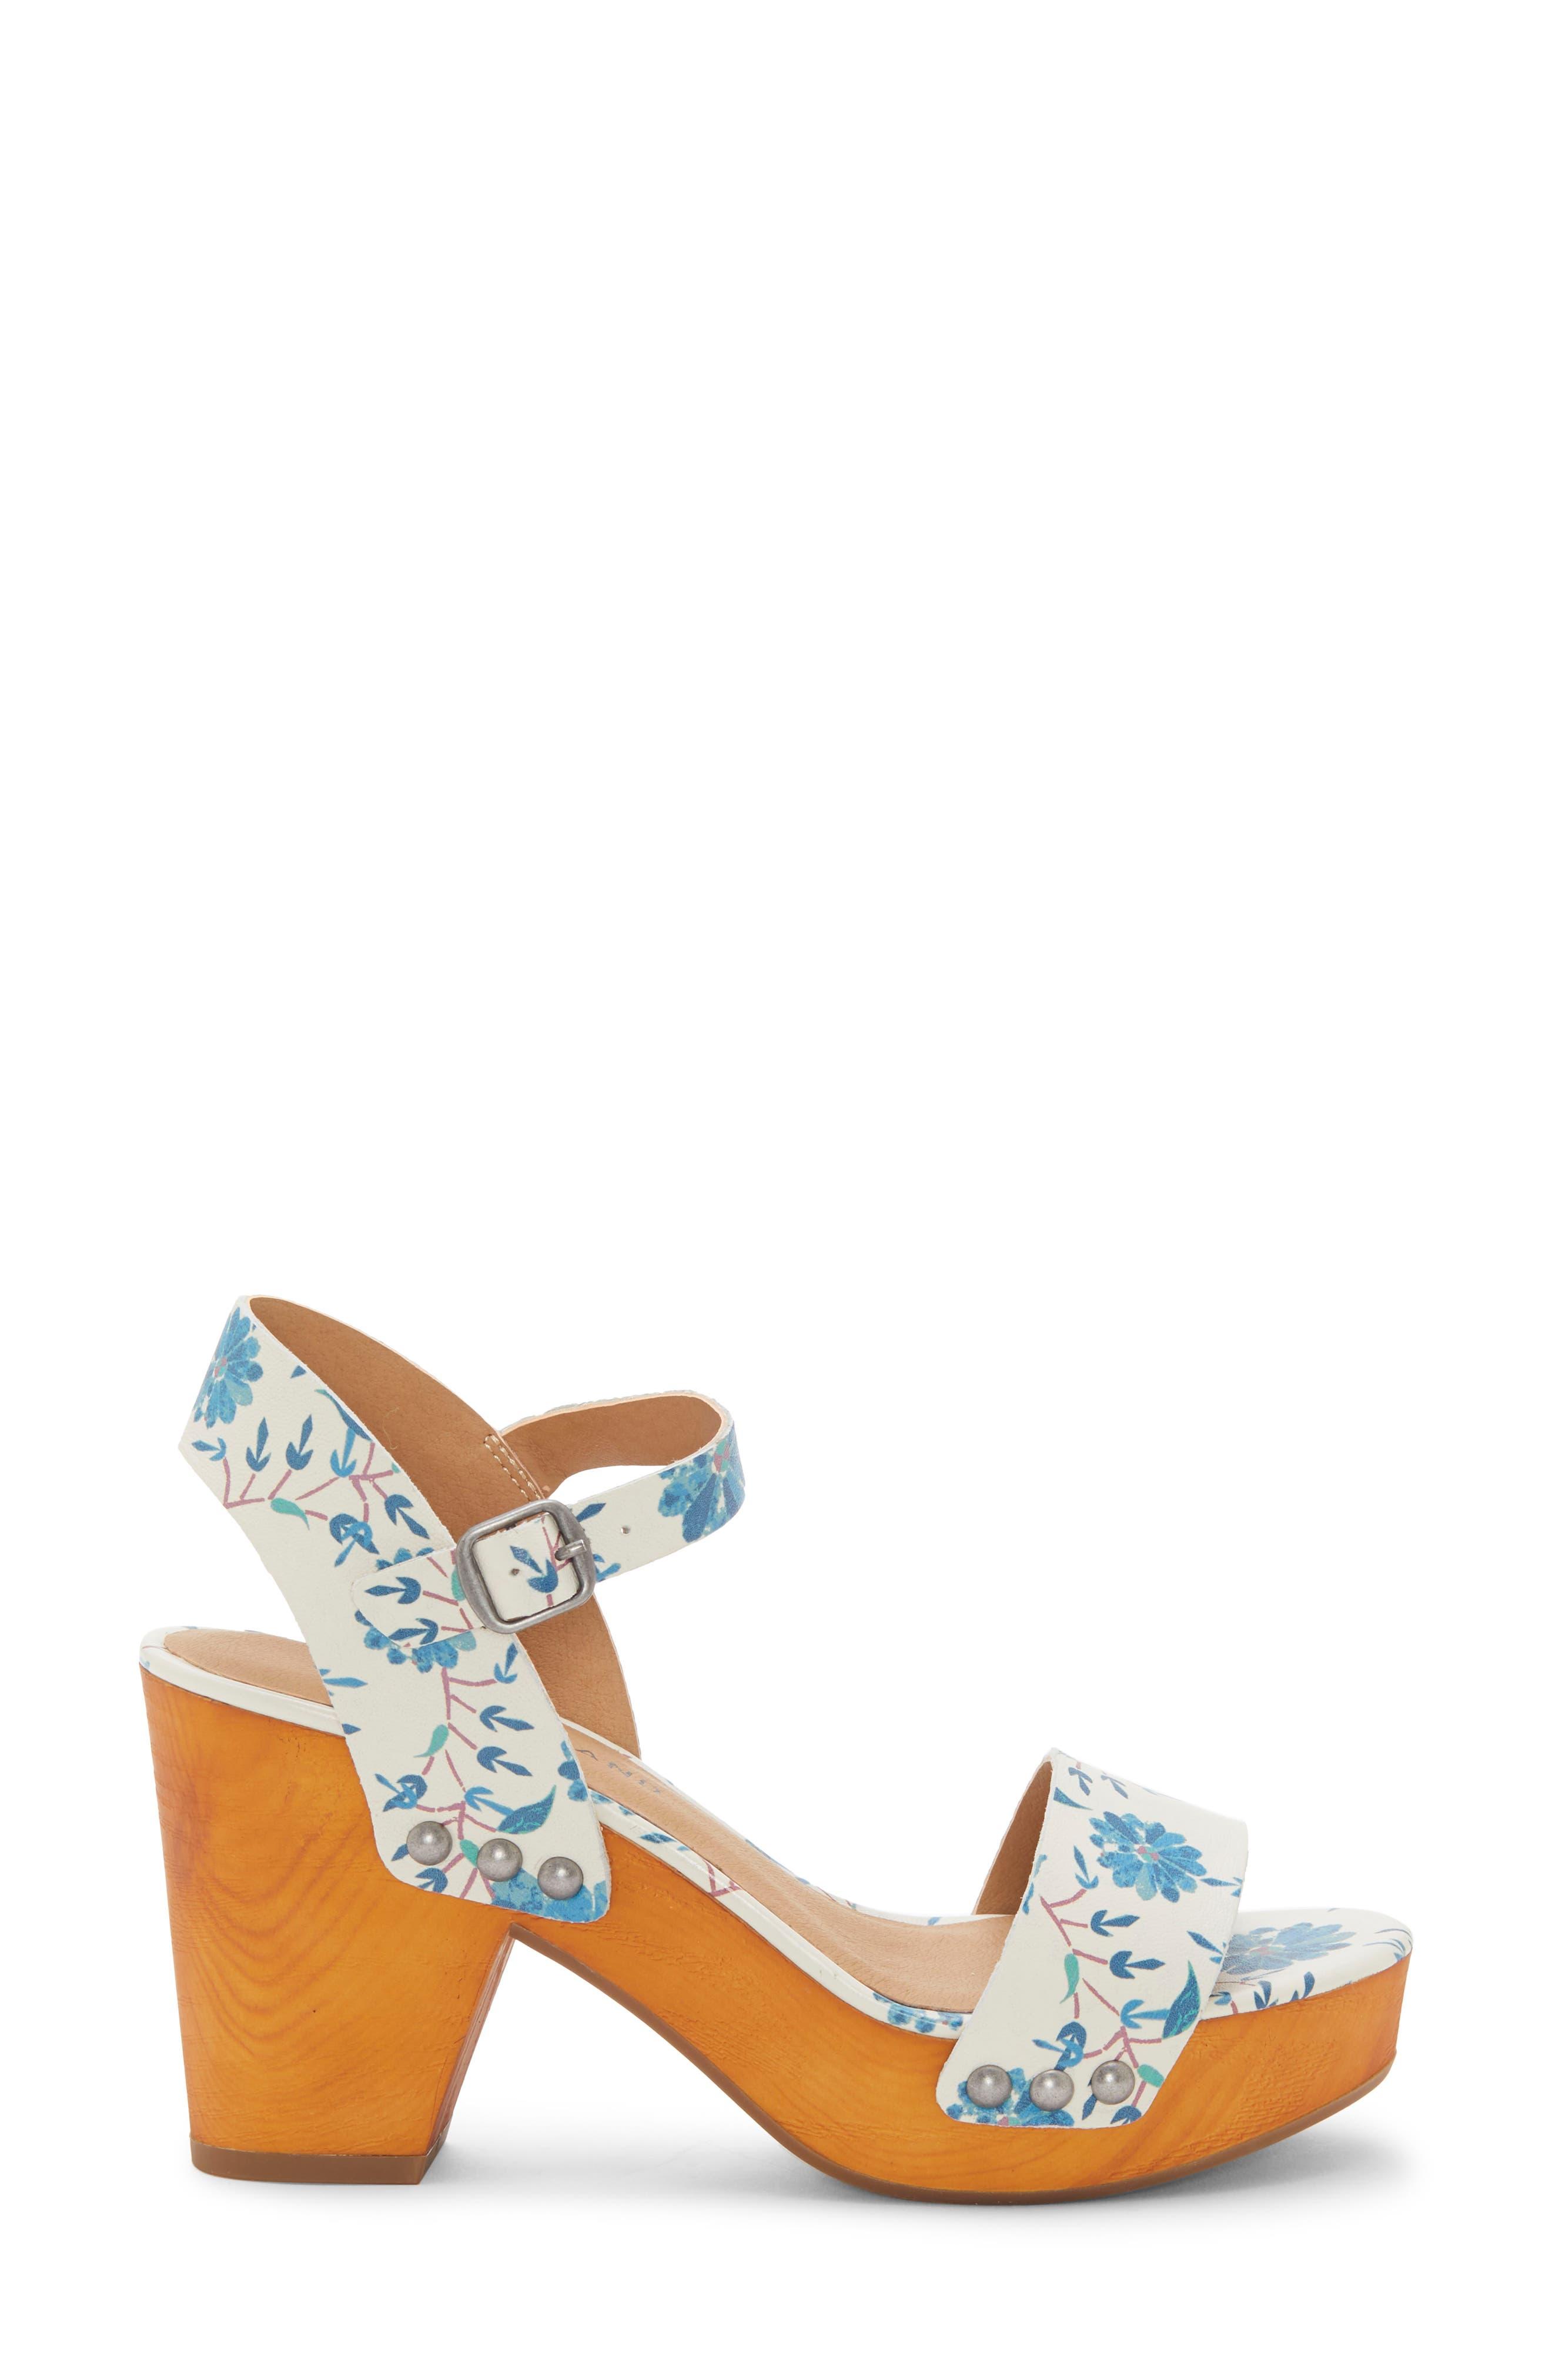 LUCKY BRAND, Trisa Platform Sandal, Alternate thumbnail 3, color, BIRCH LEATHER